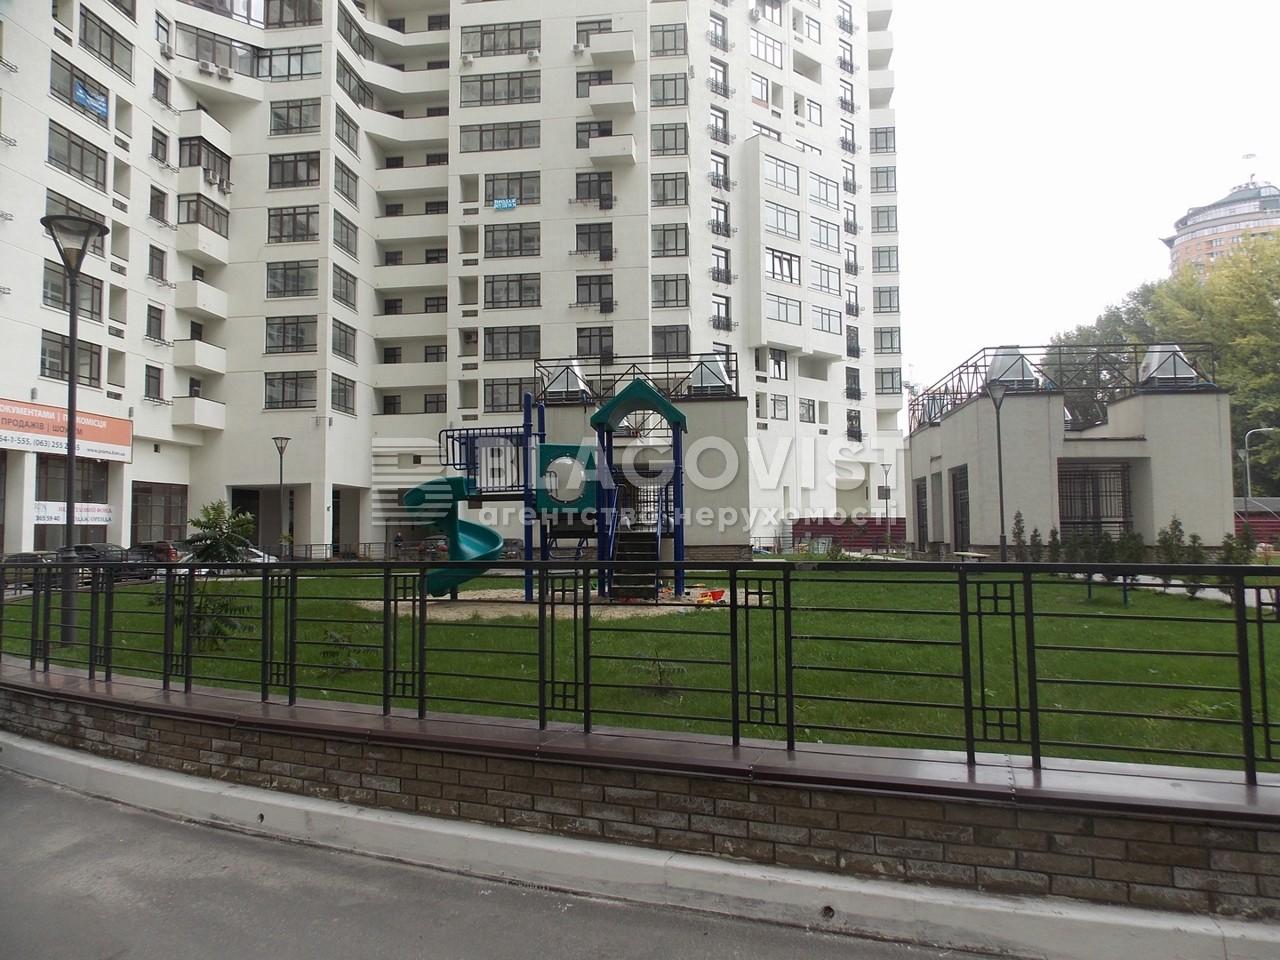 Нежитлове приміщення, D-21310, Коновальця Євгена (Щорса), Київ - Фото 4